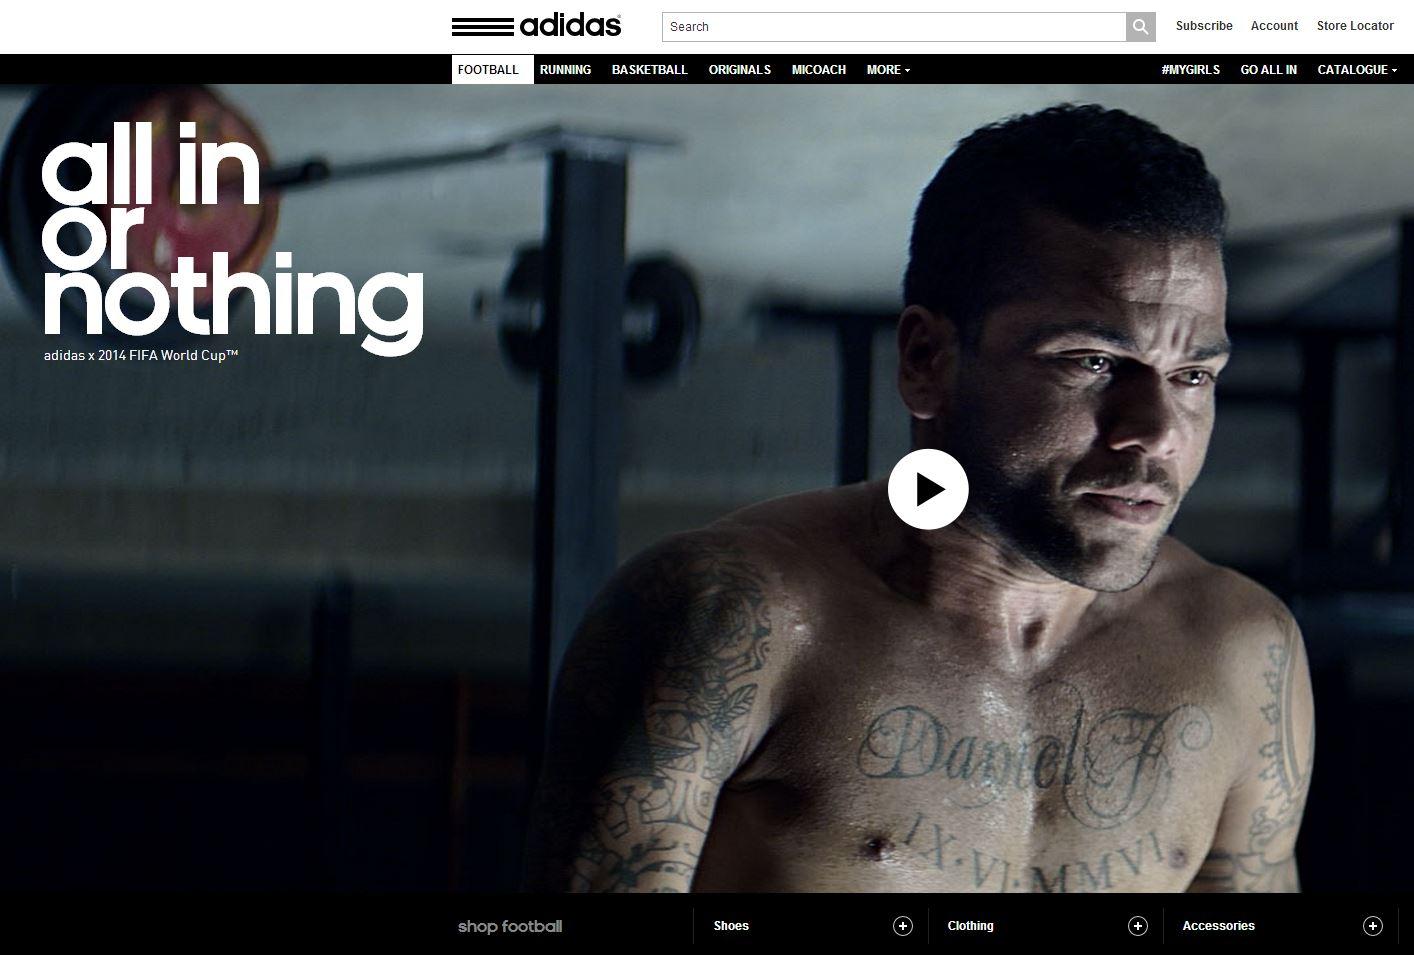 Brand Audit Adidas Copy2 On Emaze